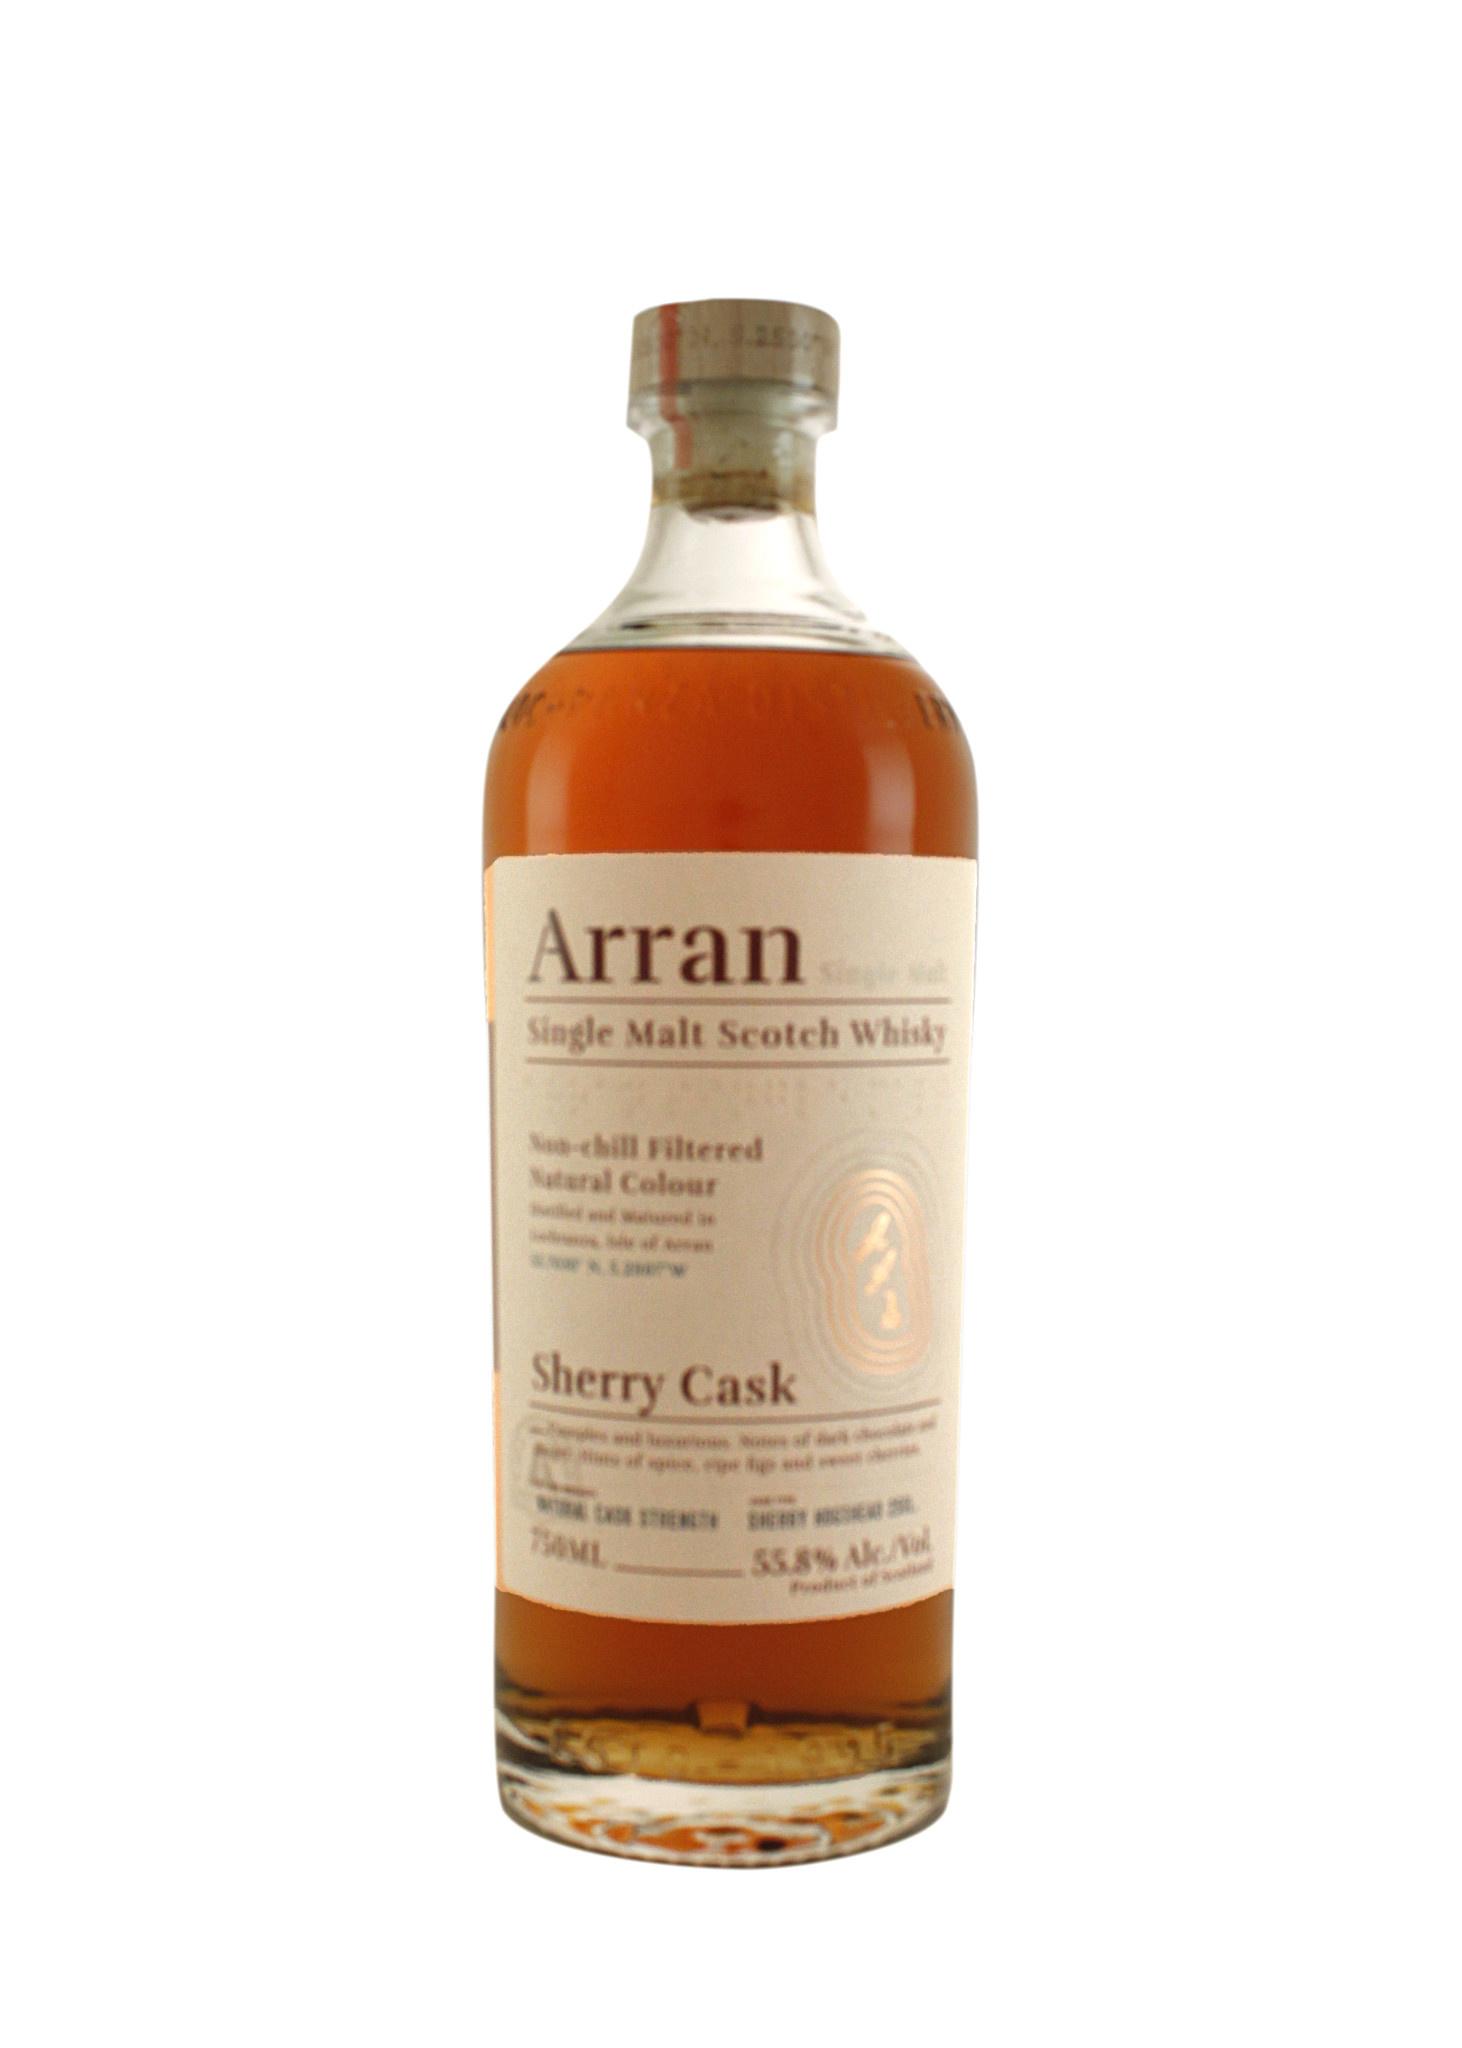 Arran Single Malt Scotch Whisky, Sherry Cask Aged, Isle of Arran